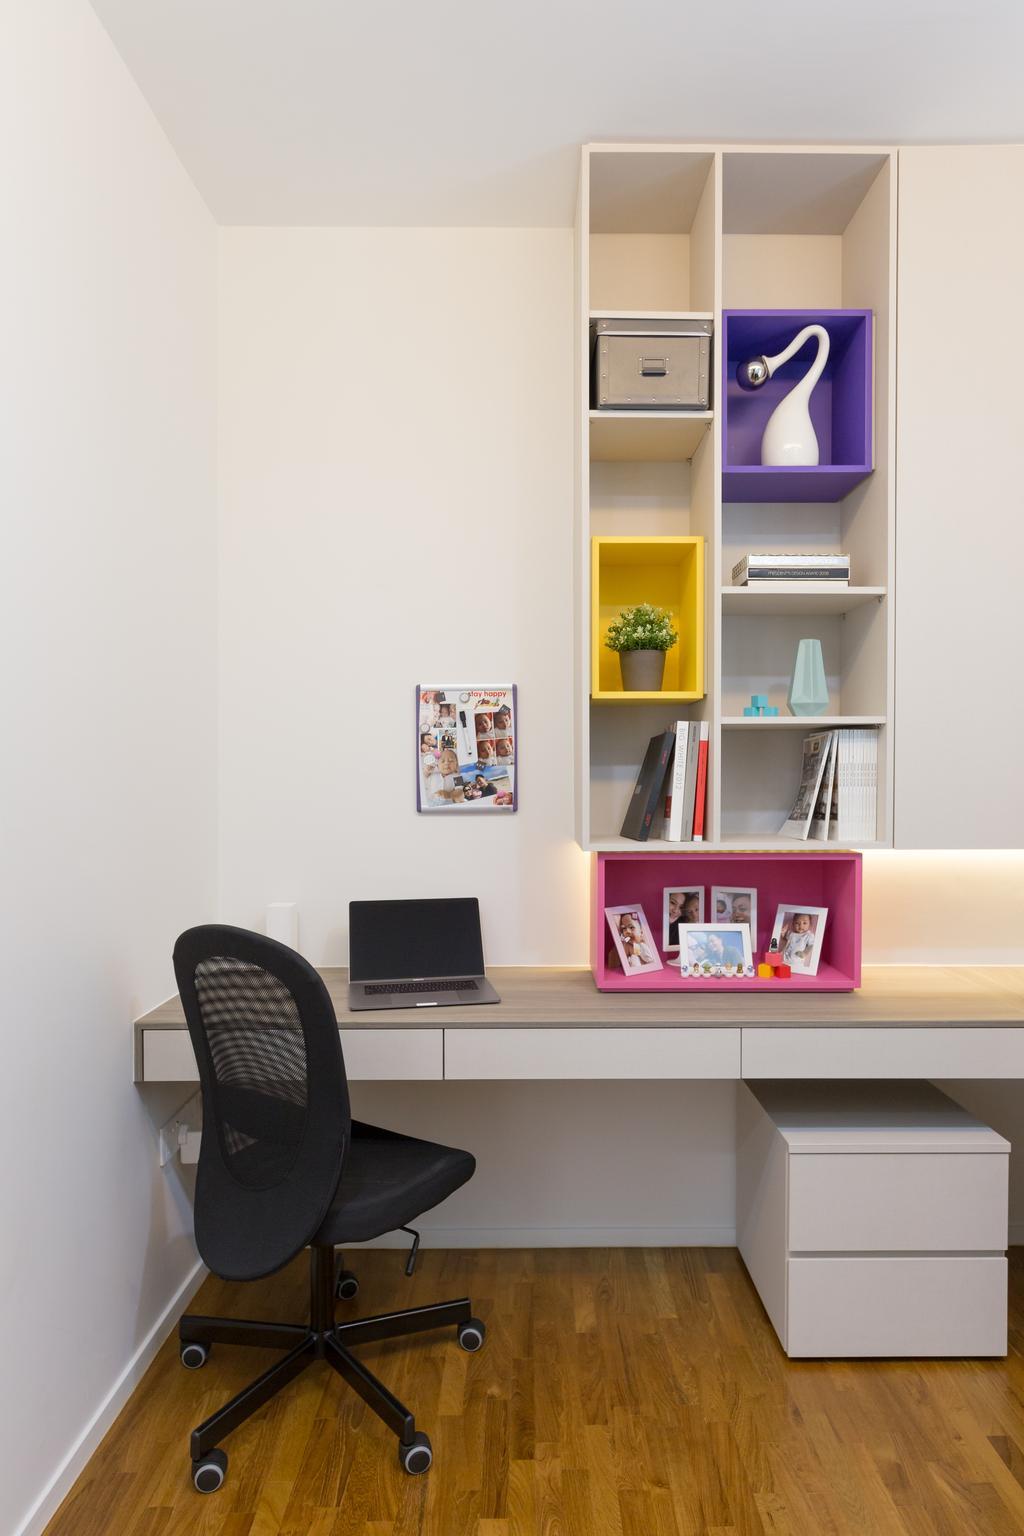 Condo, Study, The Amore, Interior Designer, Prozfile Design, Computer, Electronics, Laptop, Pc, Shelf, Bookcase, Furniture